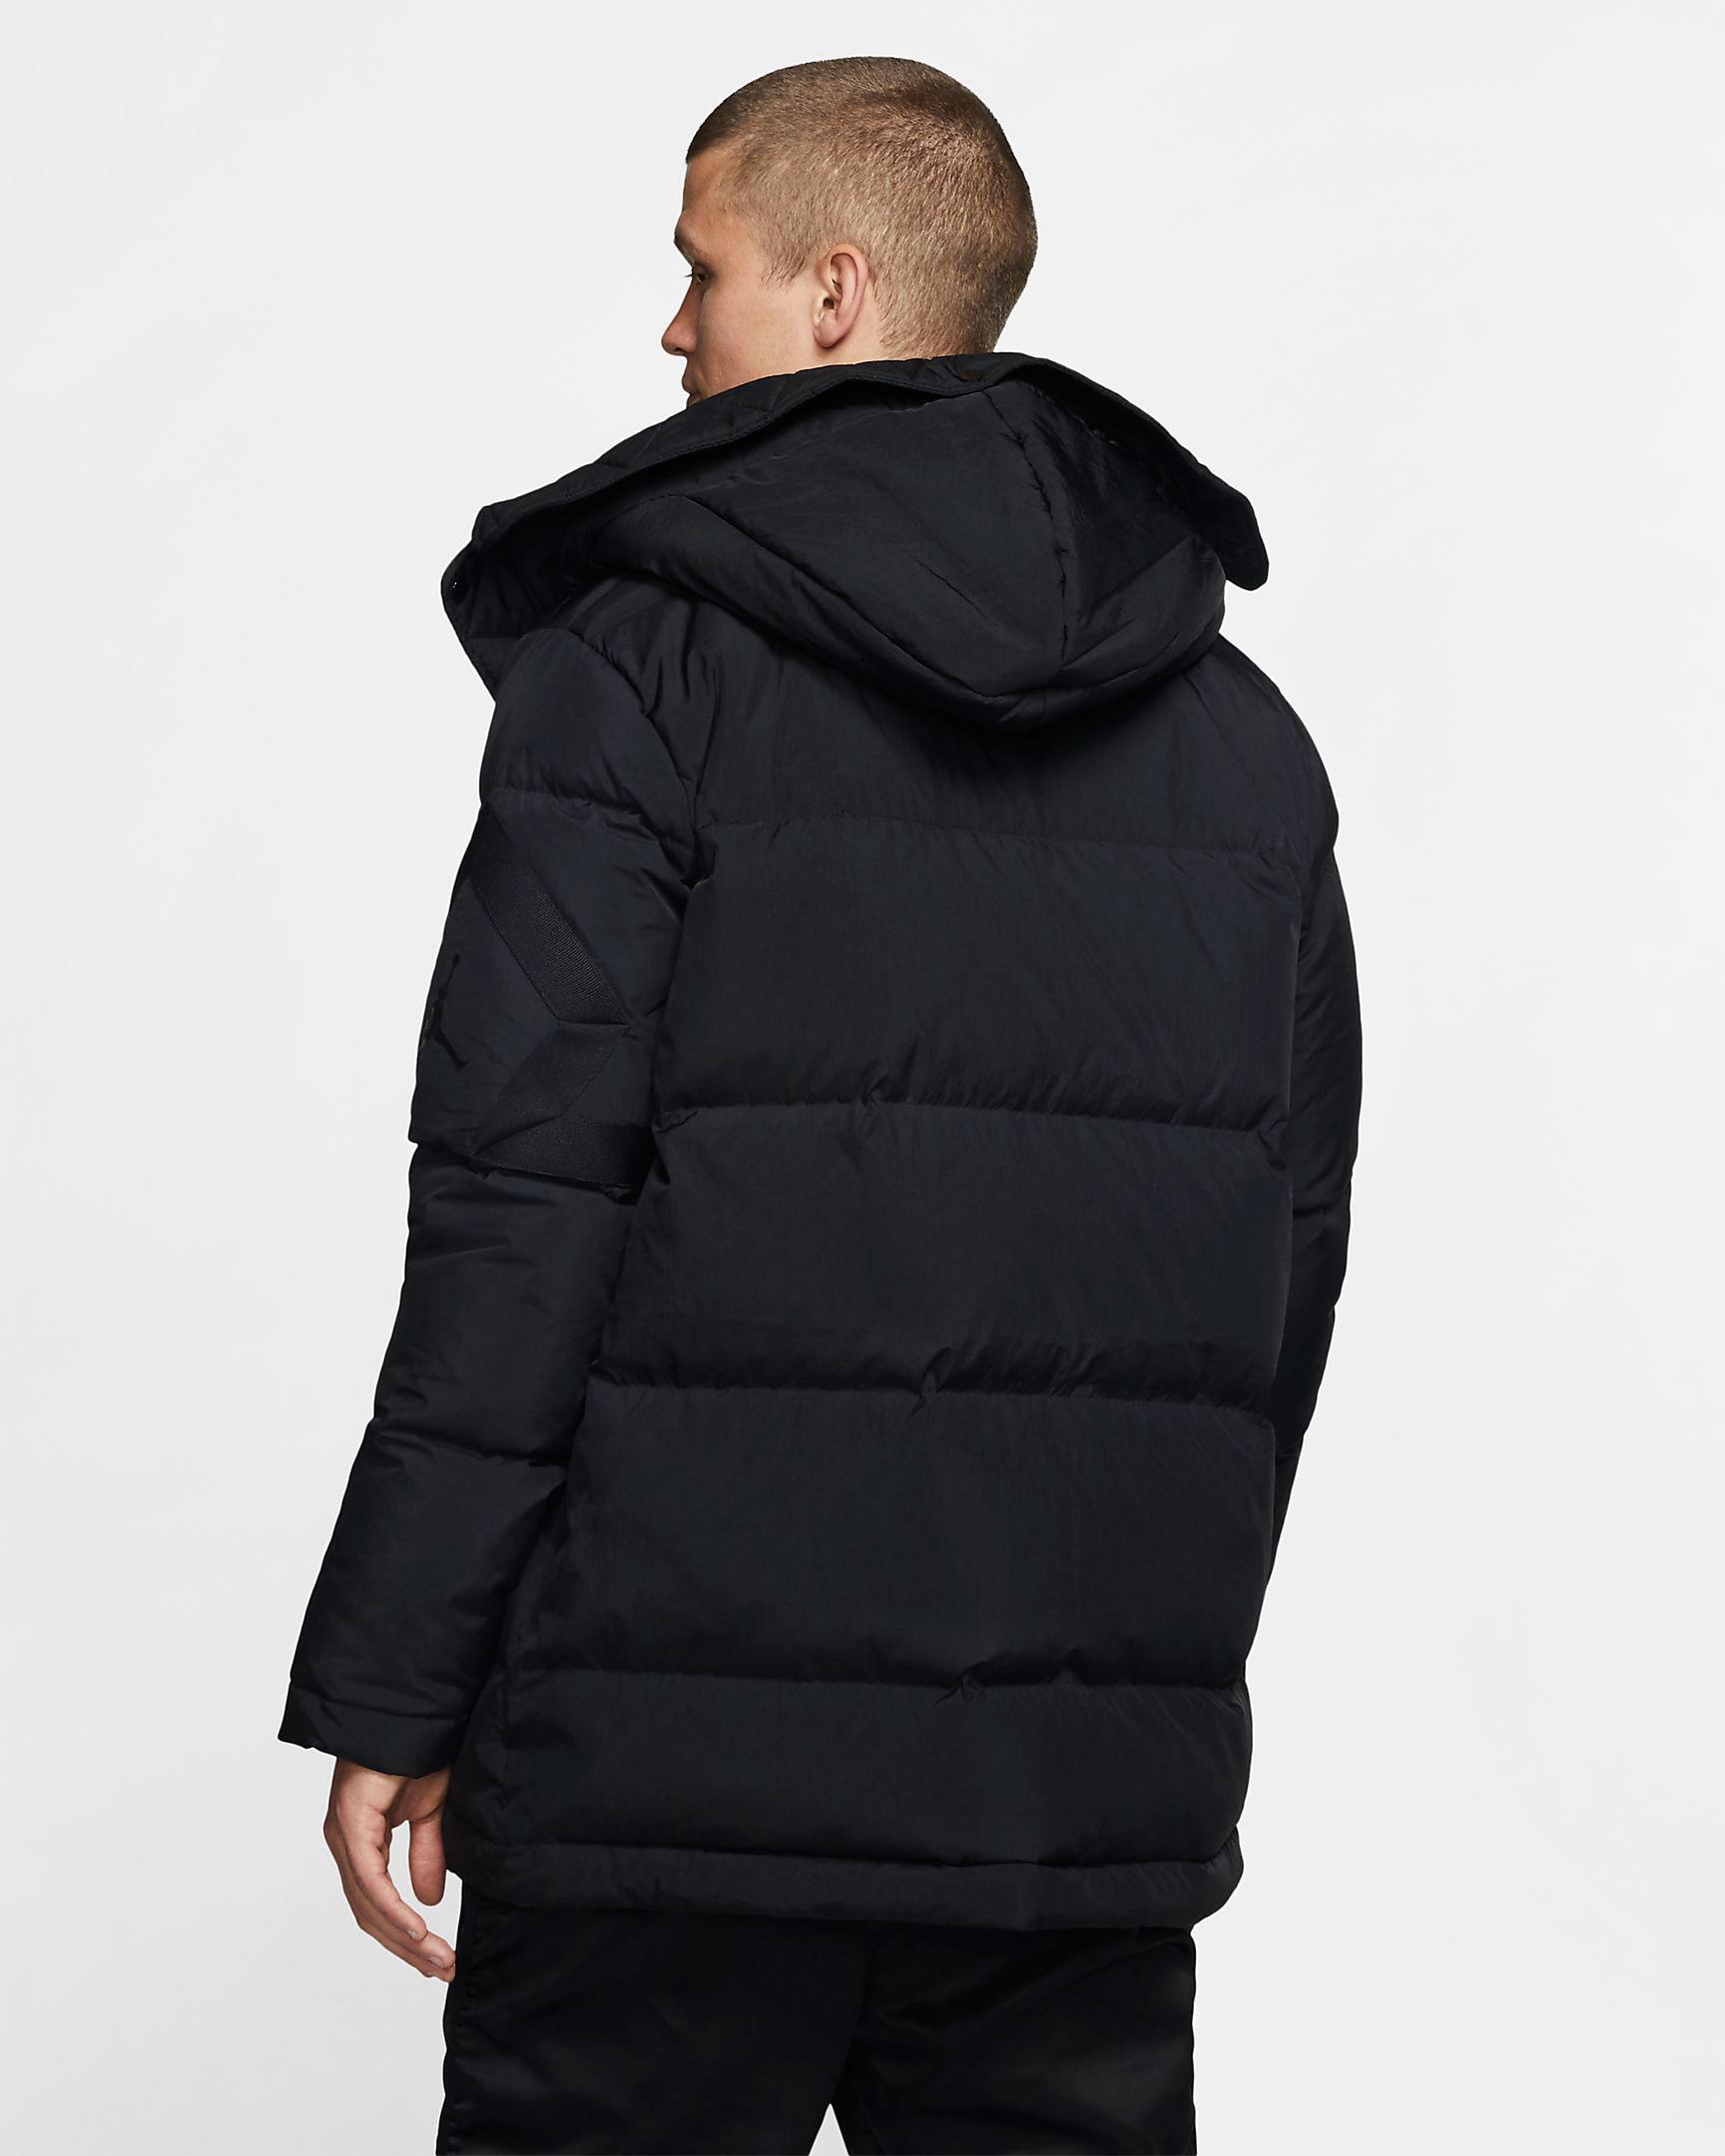 jordan-wings-down-parka-jacket-black-2